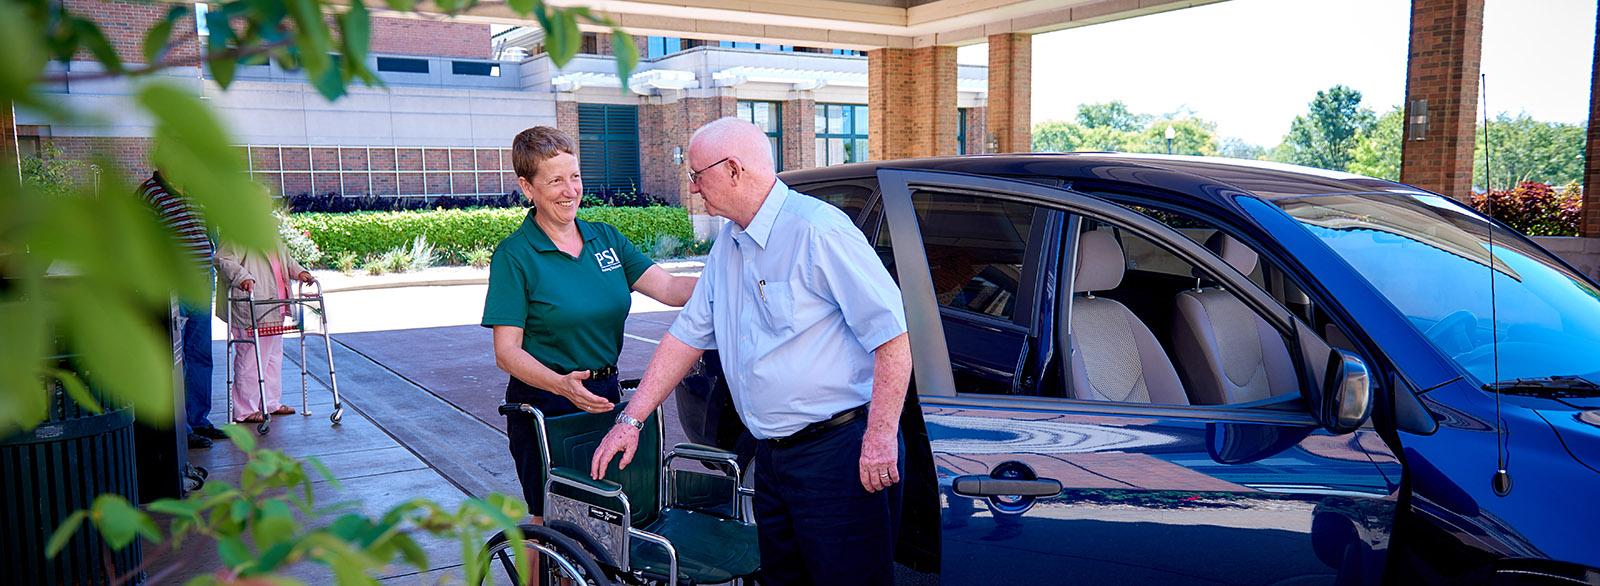 Valet service assisting visitor